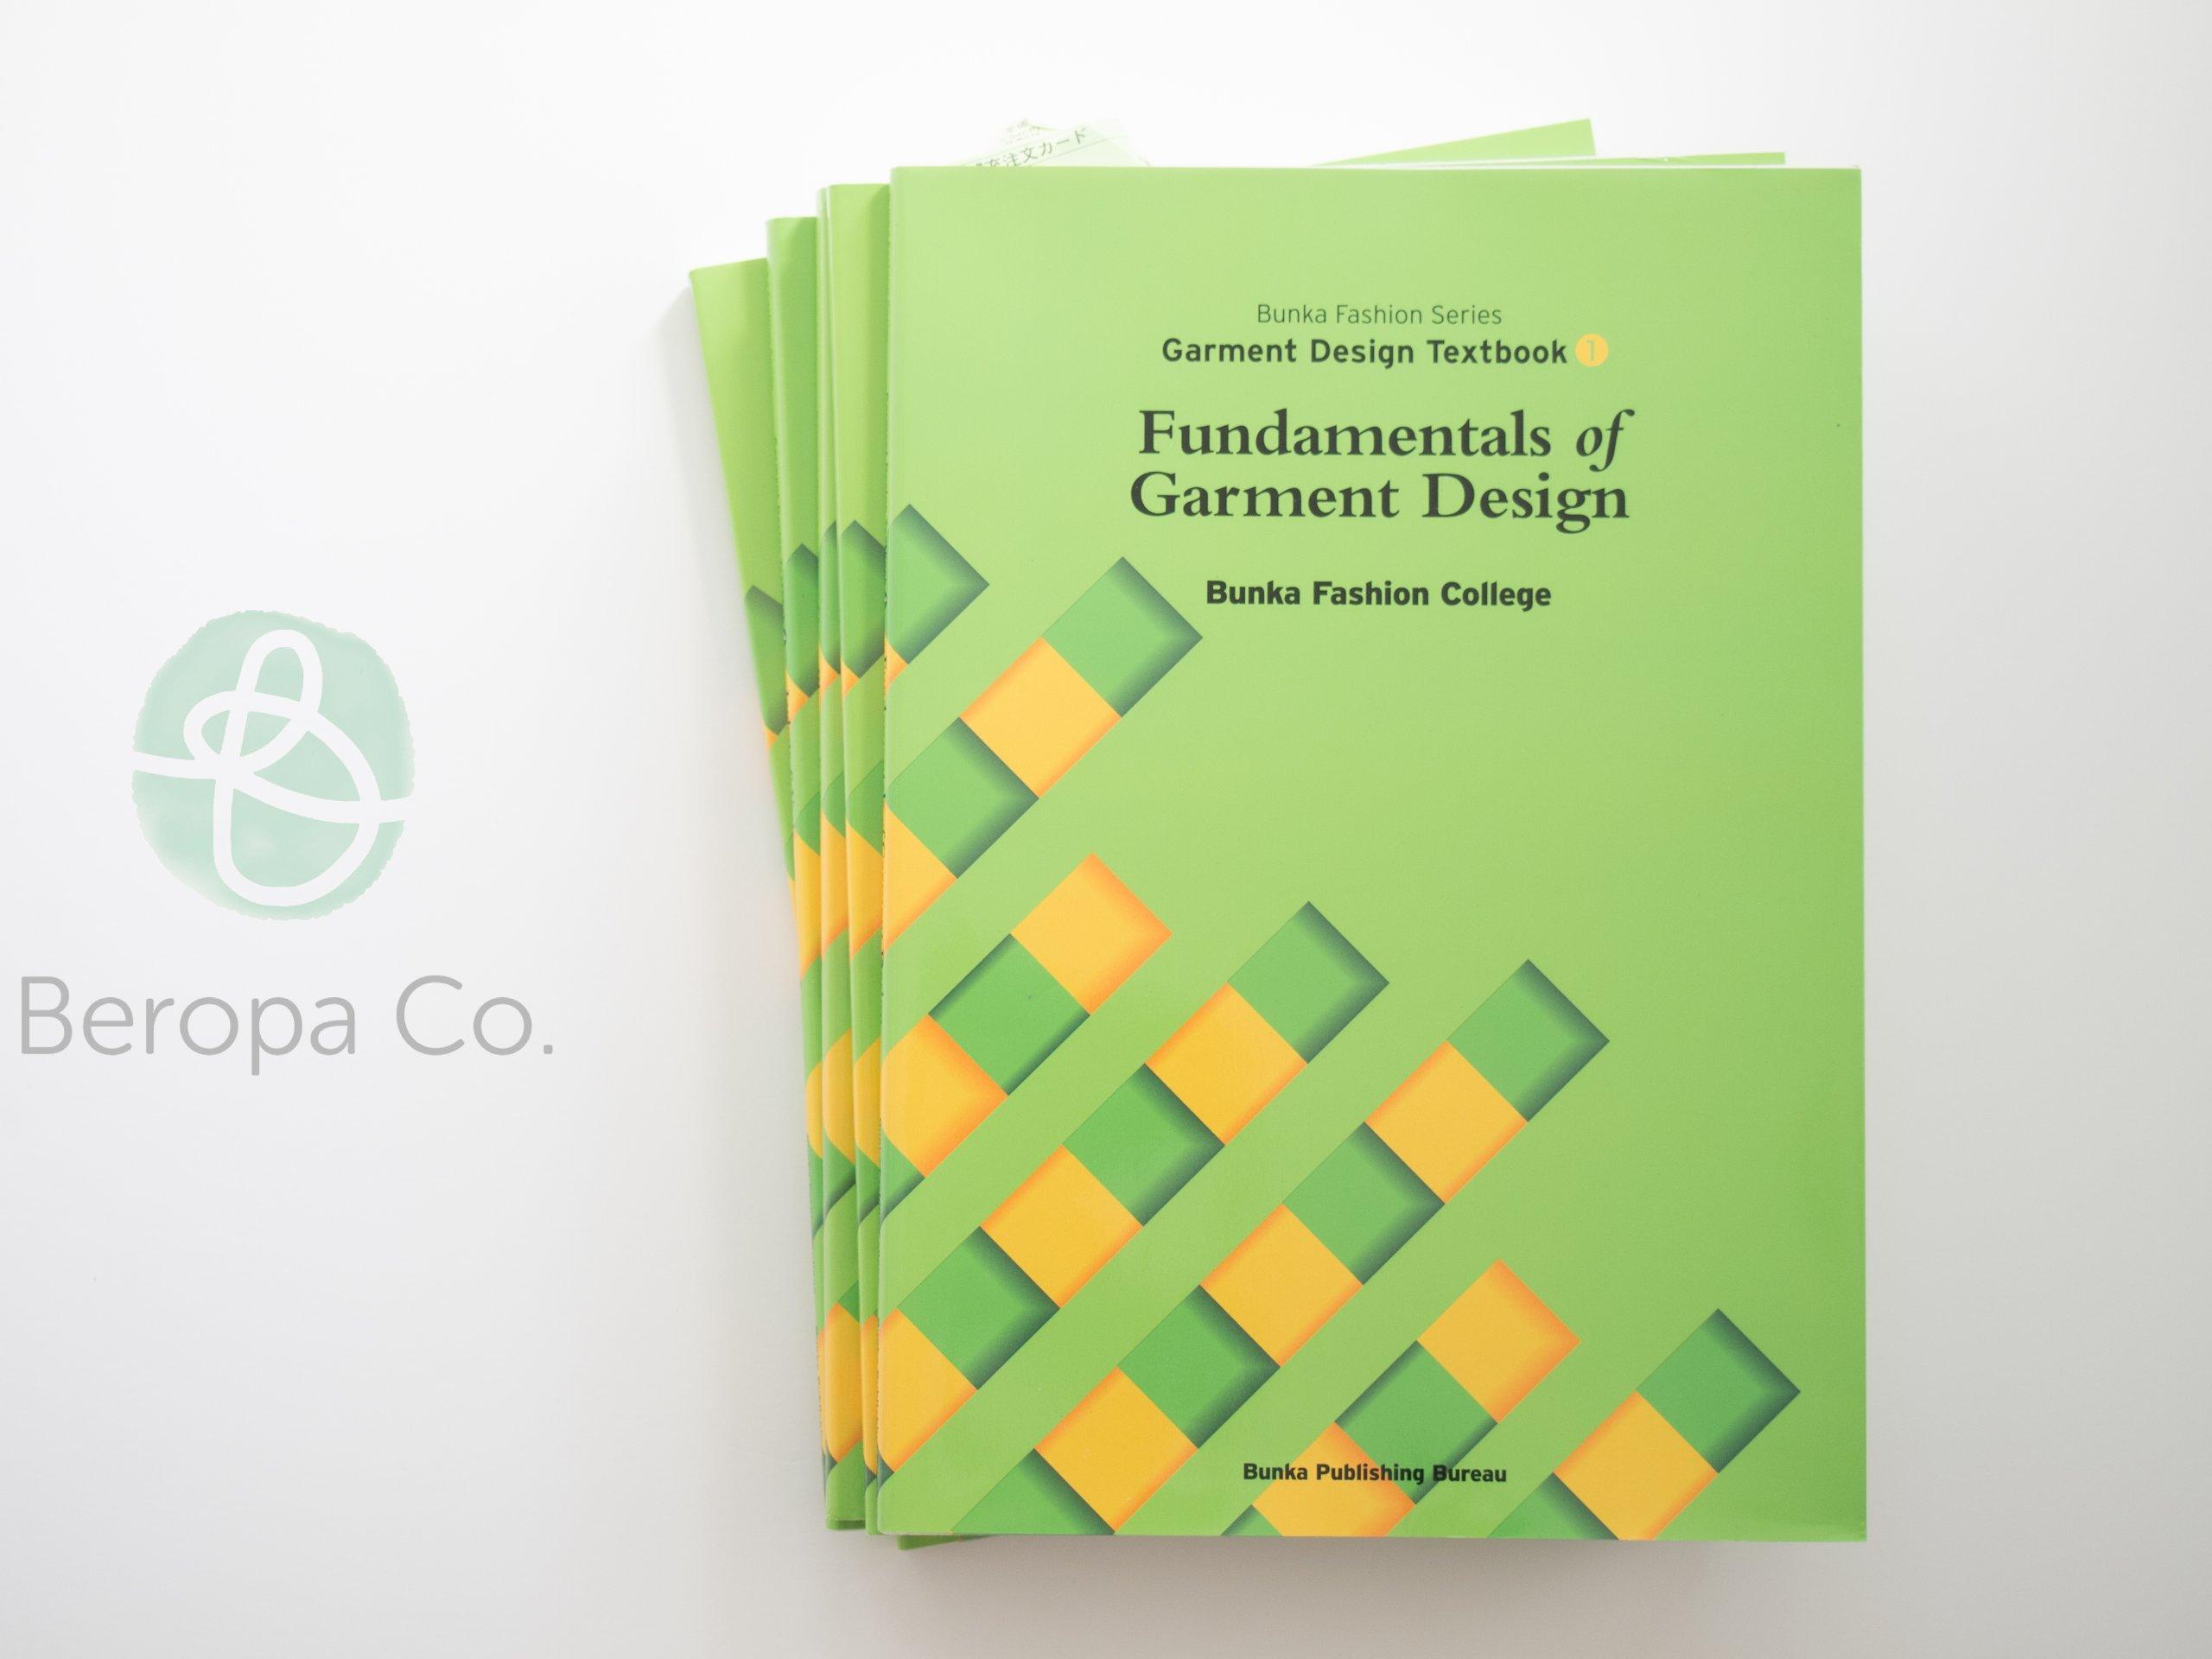 Bunka Fashion Series Garment Design Textbook 2 Skirts Pants Bunka Publishing Bureau Bunka Fashion College Sunao Onuma Dr Satoshi Onuma 9784579112395 Amazon Com Books